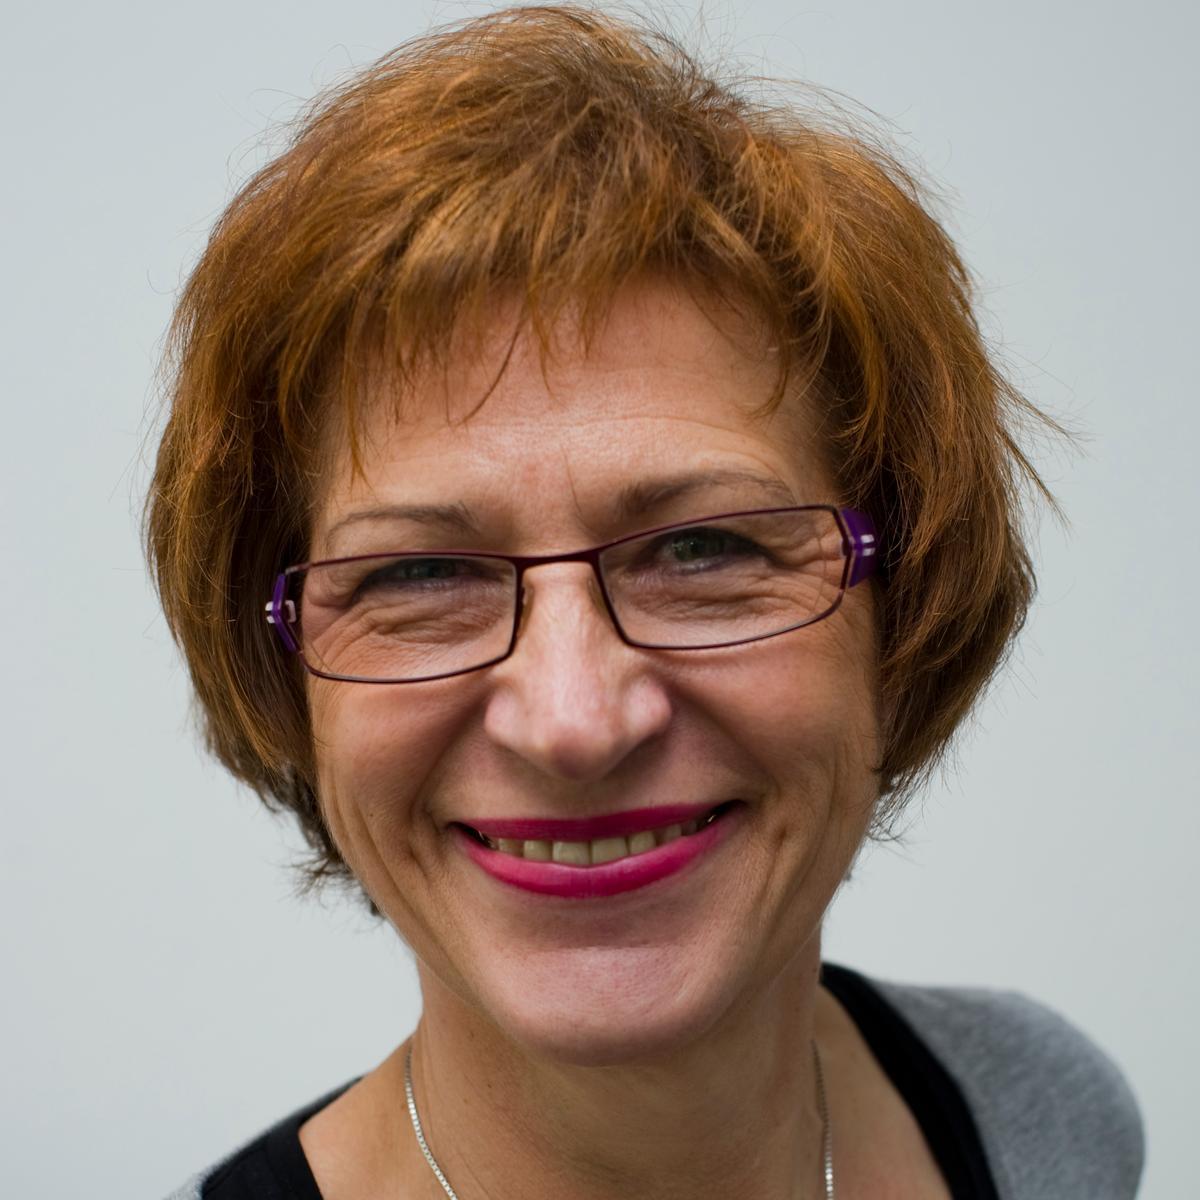 Barbara Markus